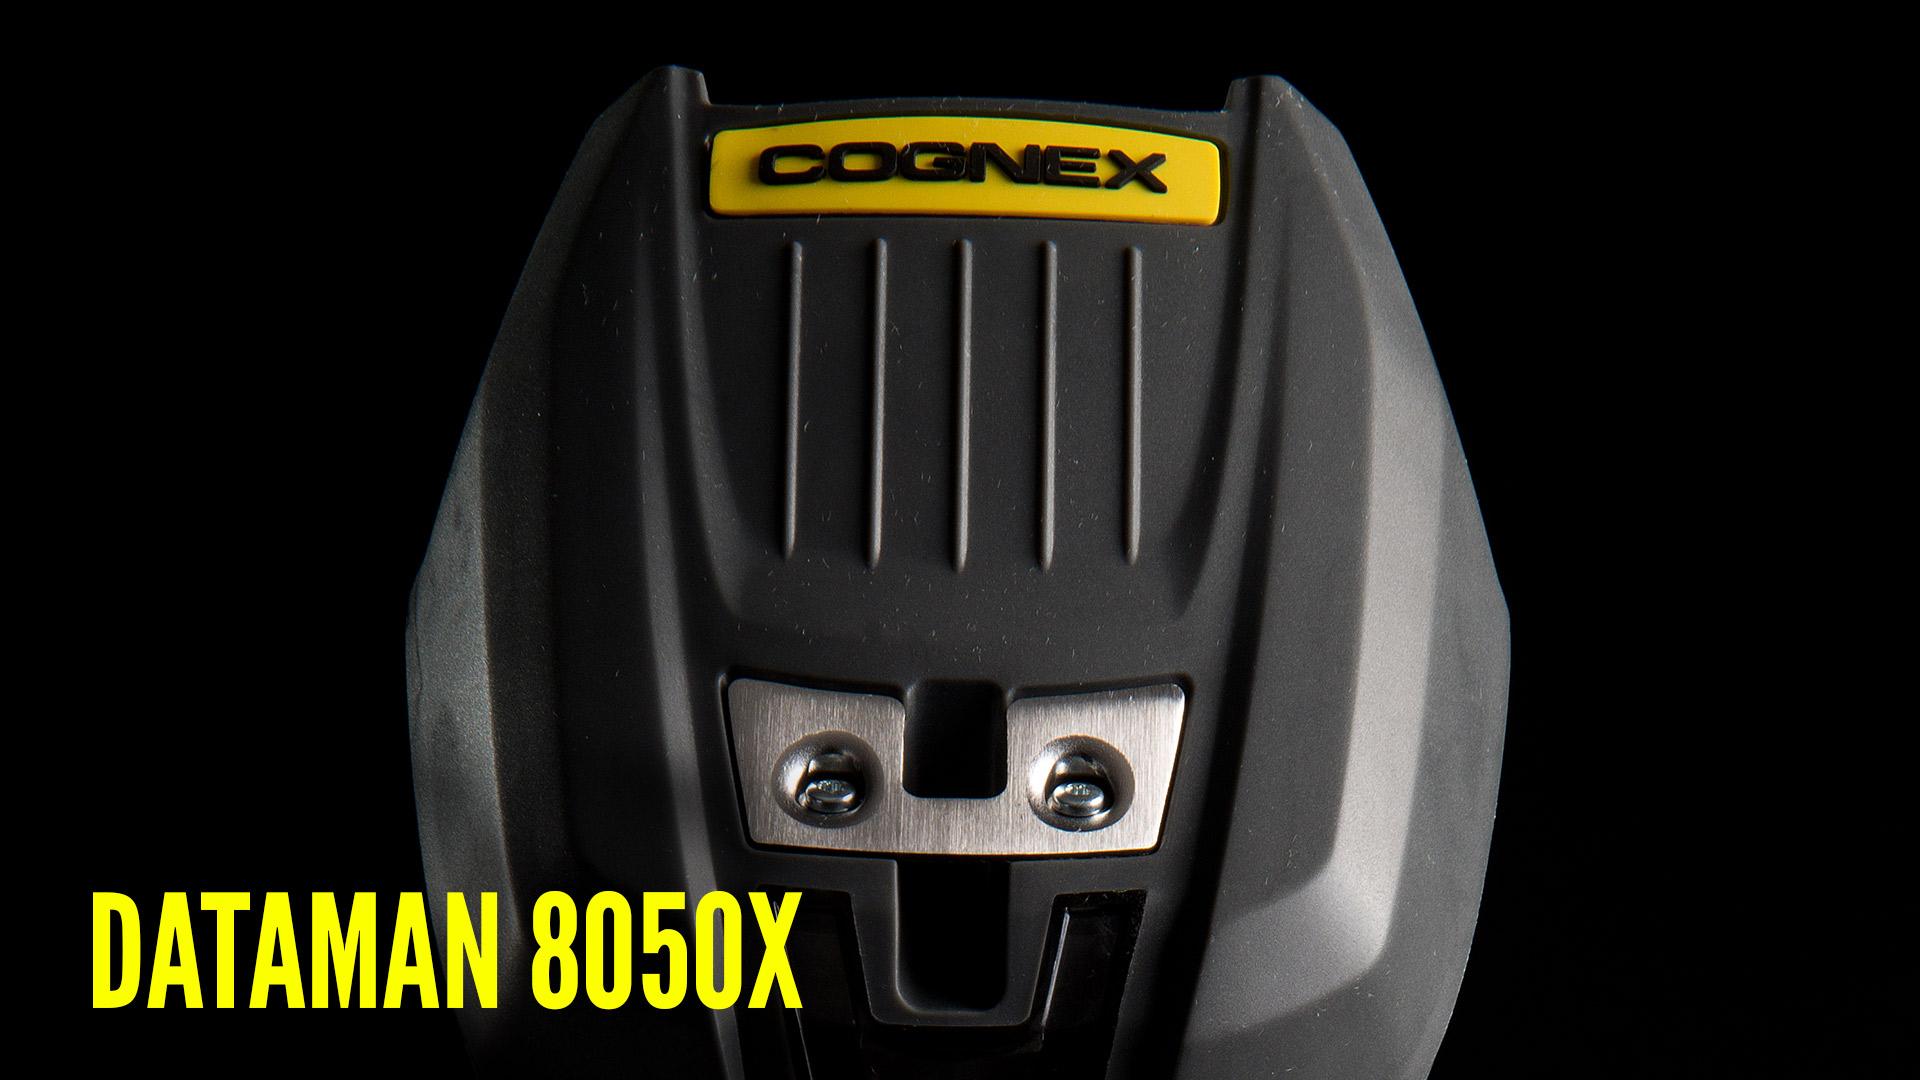 DataMan 8050X Overview